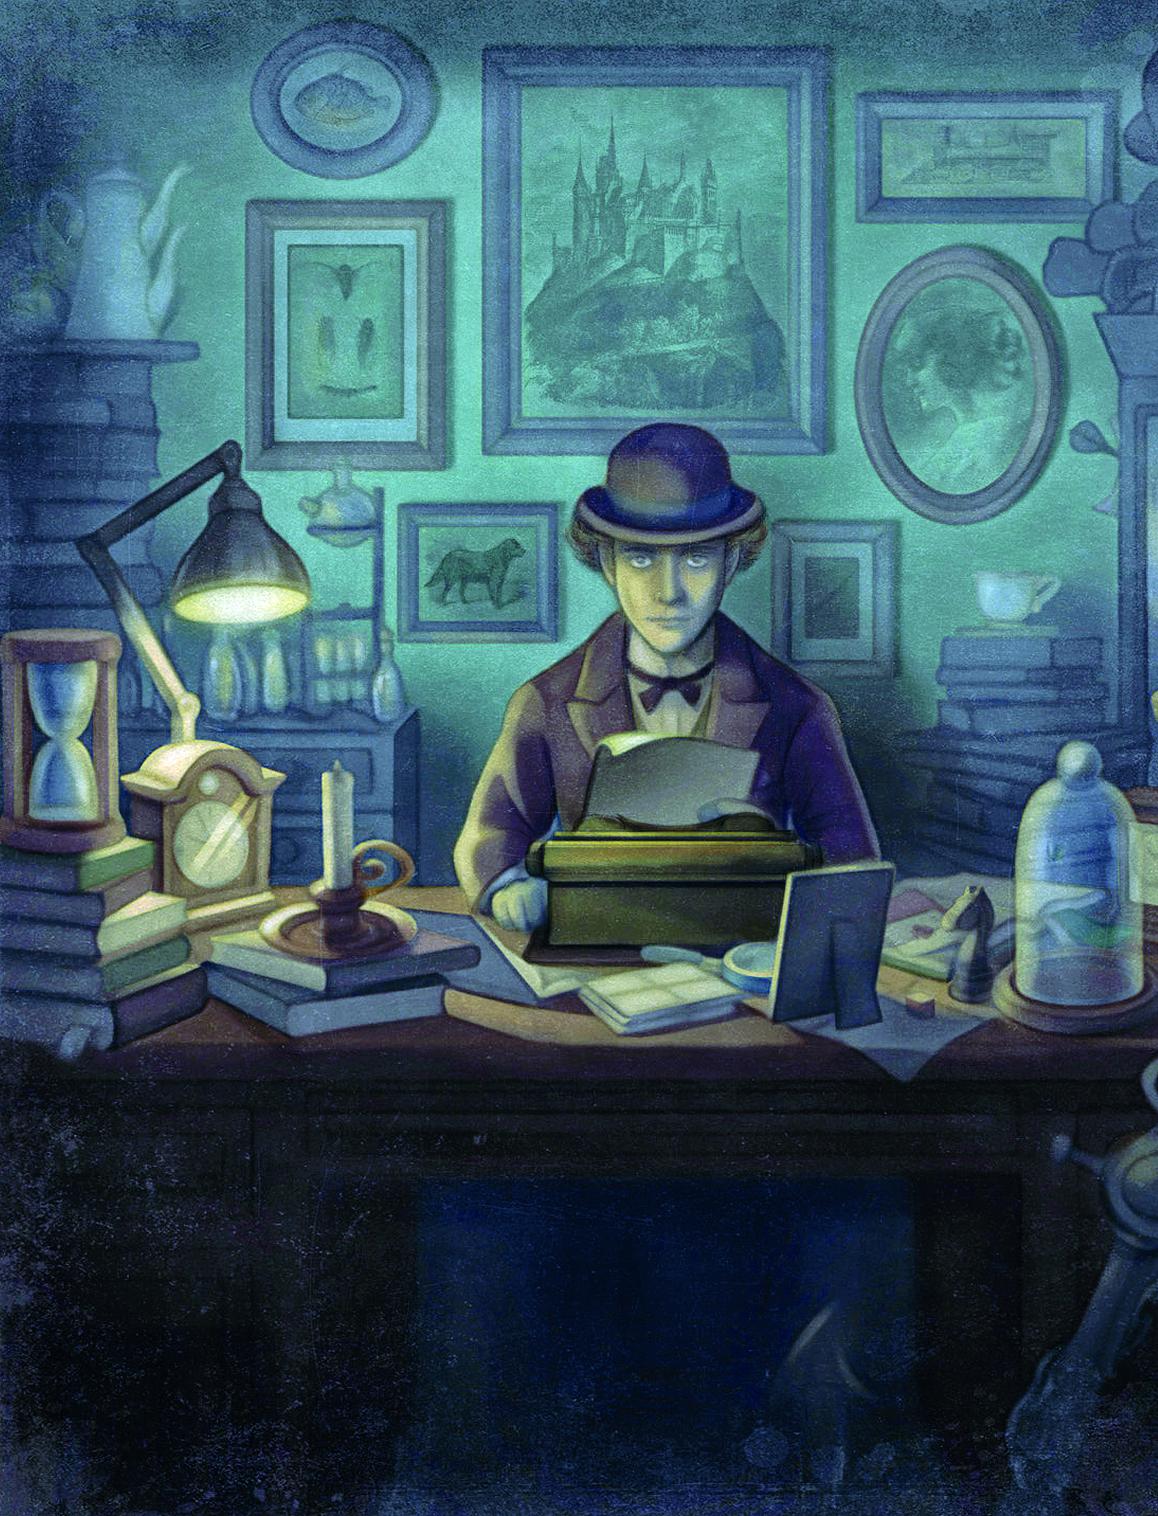 Un'immagine tratta da The Franz Kafka Videogame